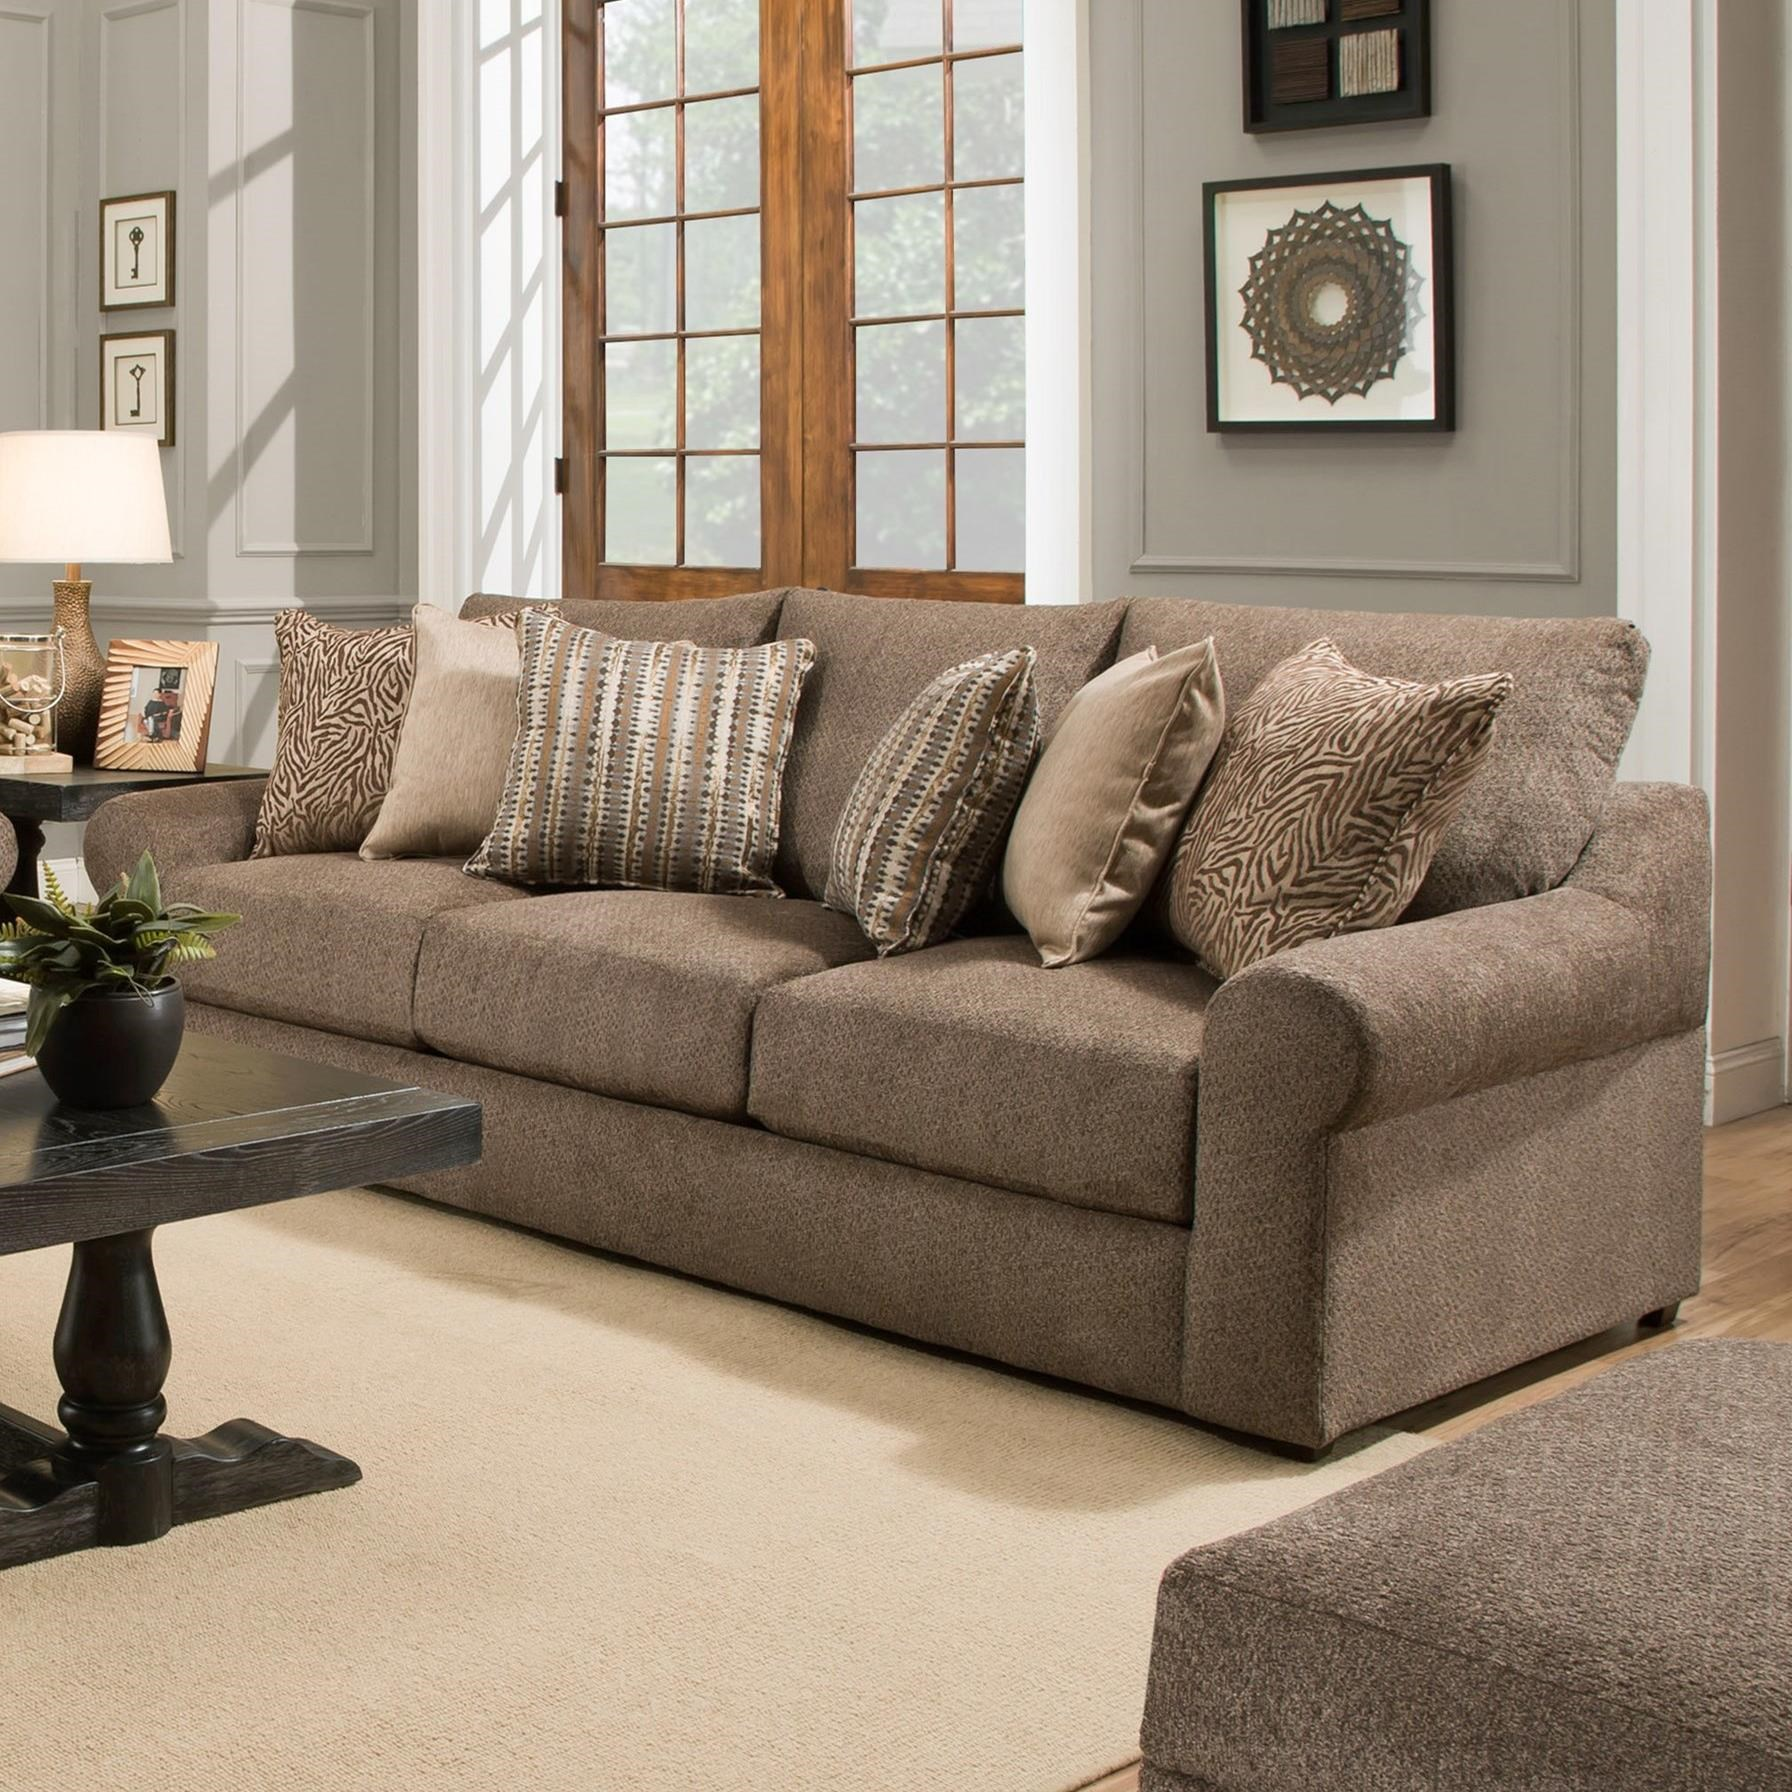 United Furniture Industries 9906 Sofa - Item Number: 9906BRSofa-Bellamy Cocoa